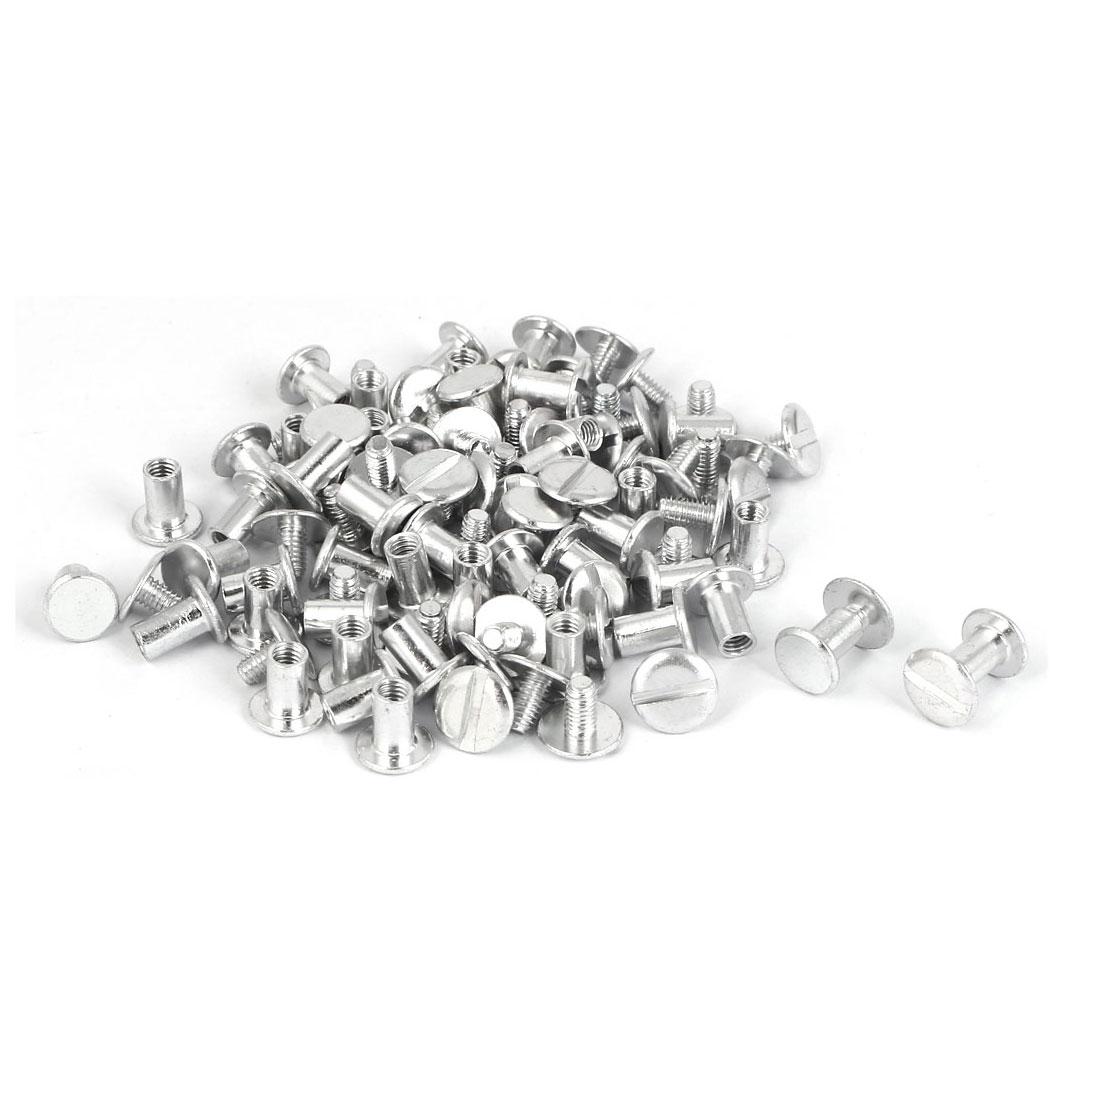 Purse Belts Scrapbooks Binding Chicago Screws Posts Silver Tone M5 x 8mm 200 Pcs